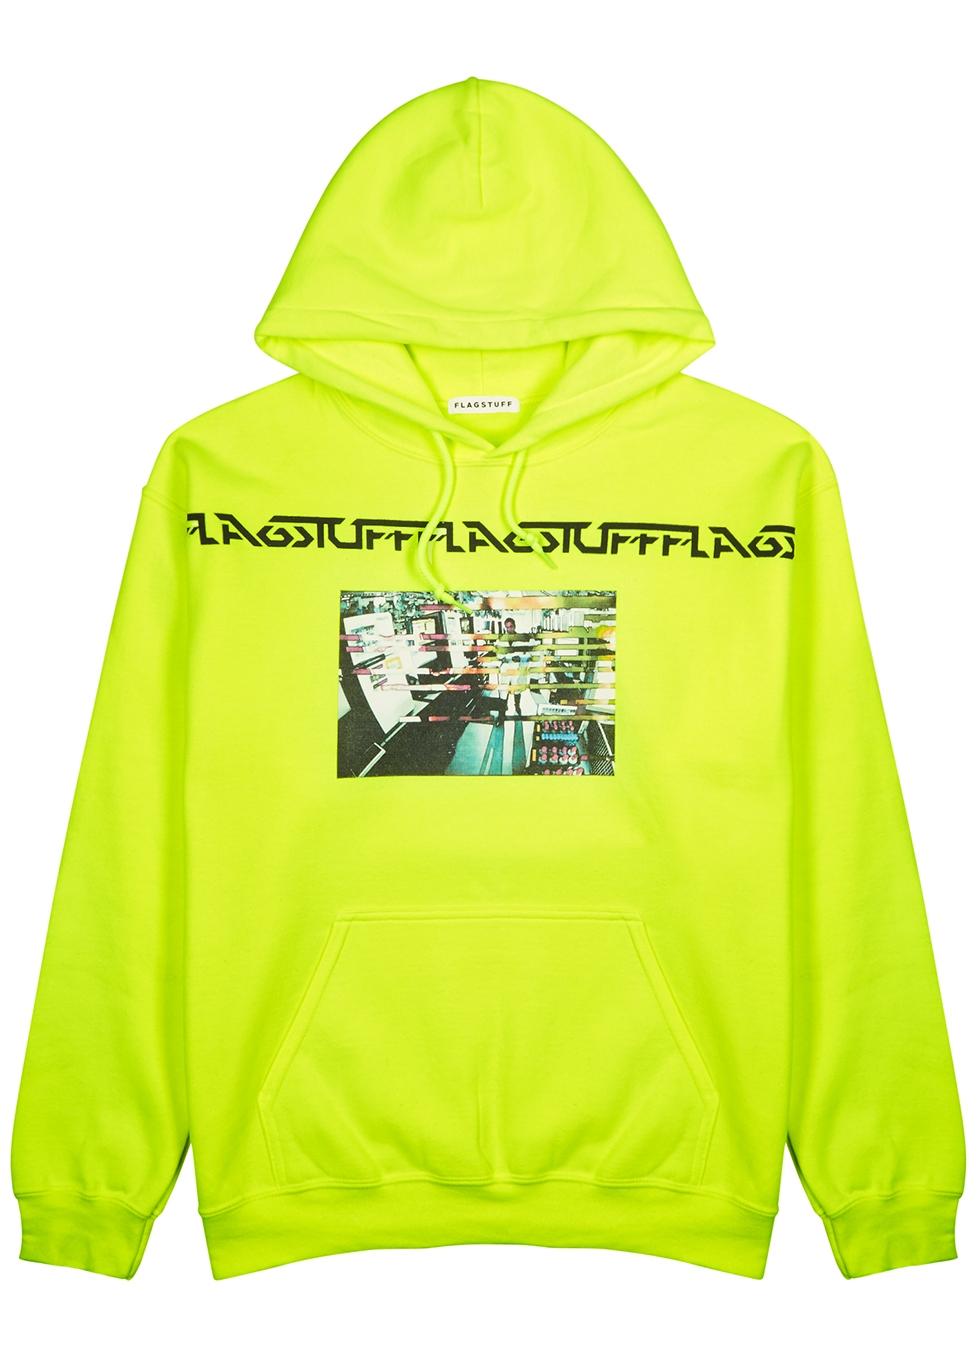 Neon yellow cotton-blend sweatshirt - Flagstuff